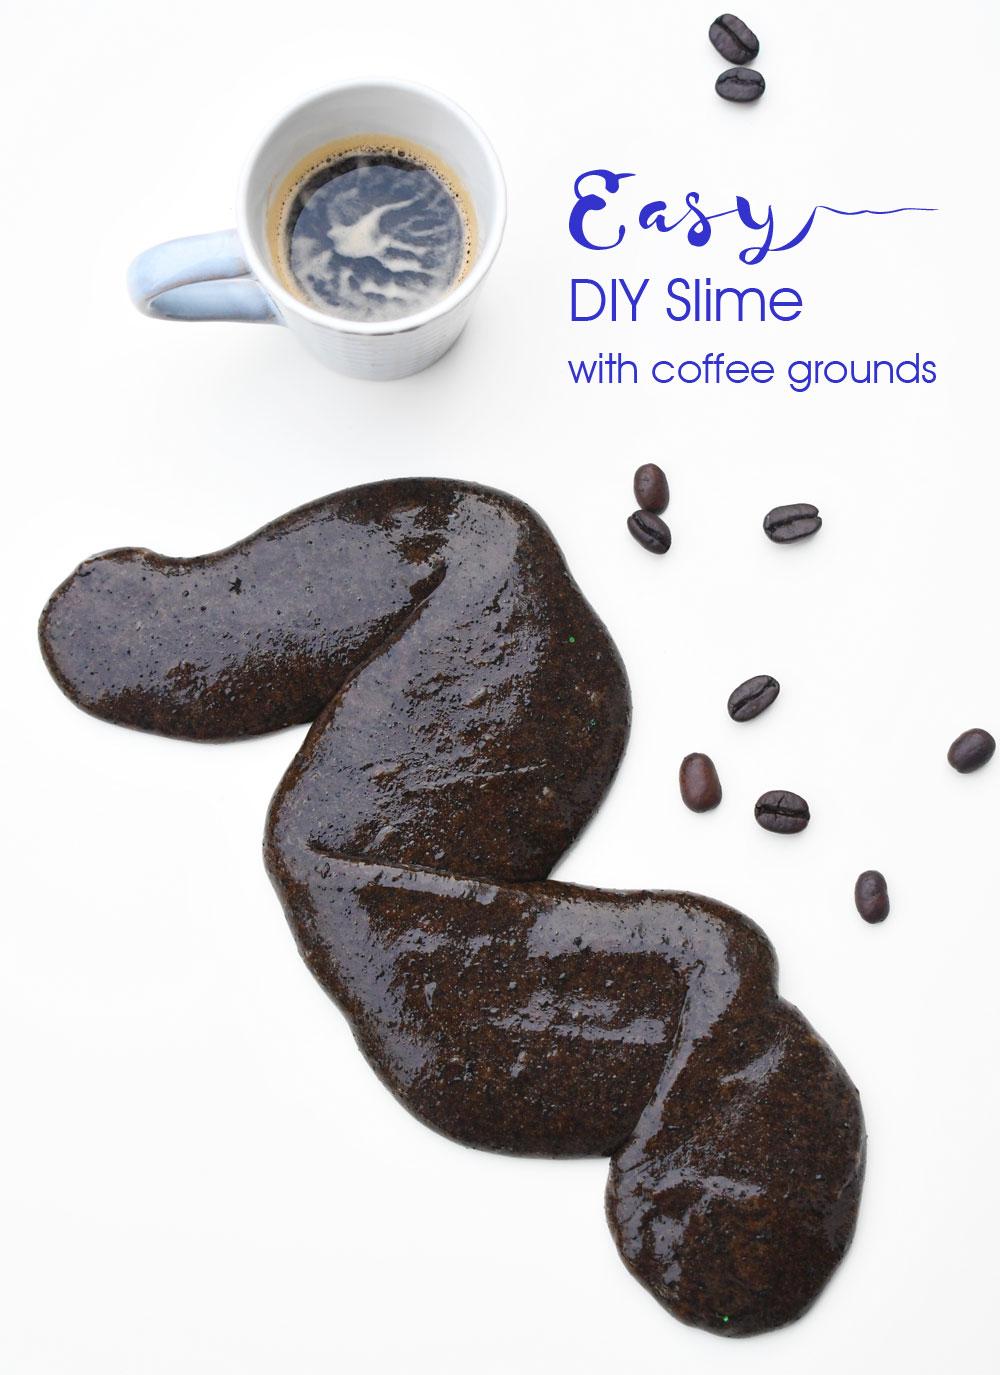 DIY slime with coffee grounds